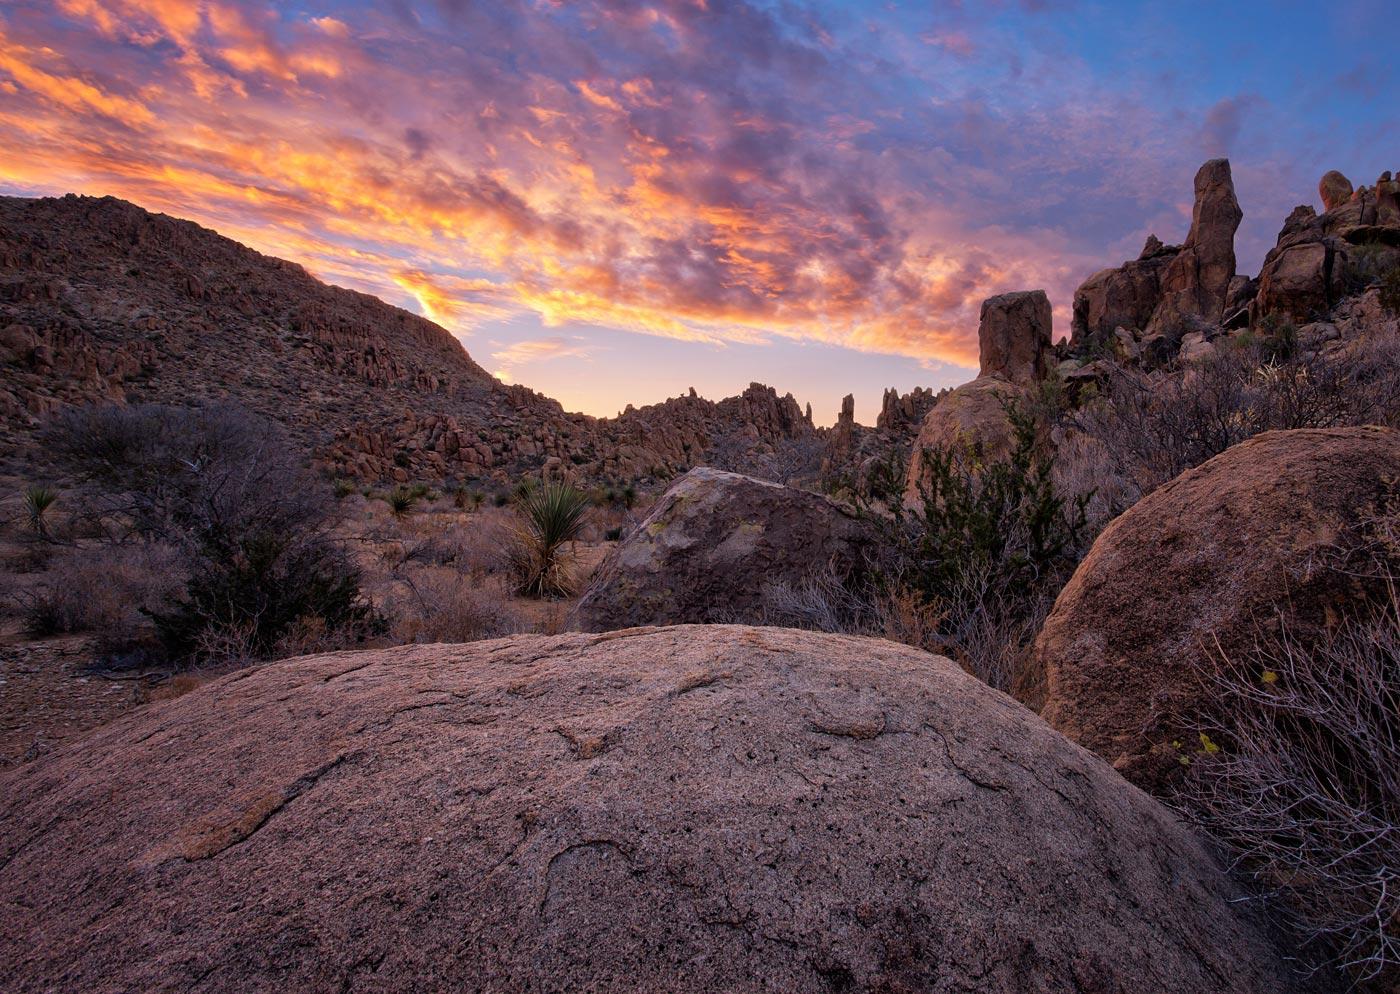 Big-Bend-National-Park-ABP-GrapevineHills_Sunrise.jpg